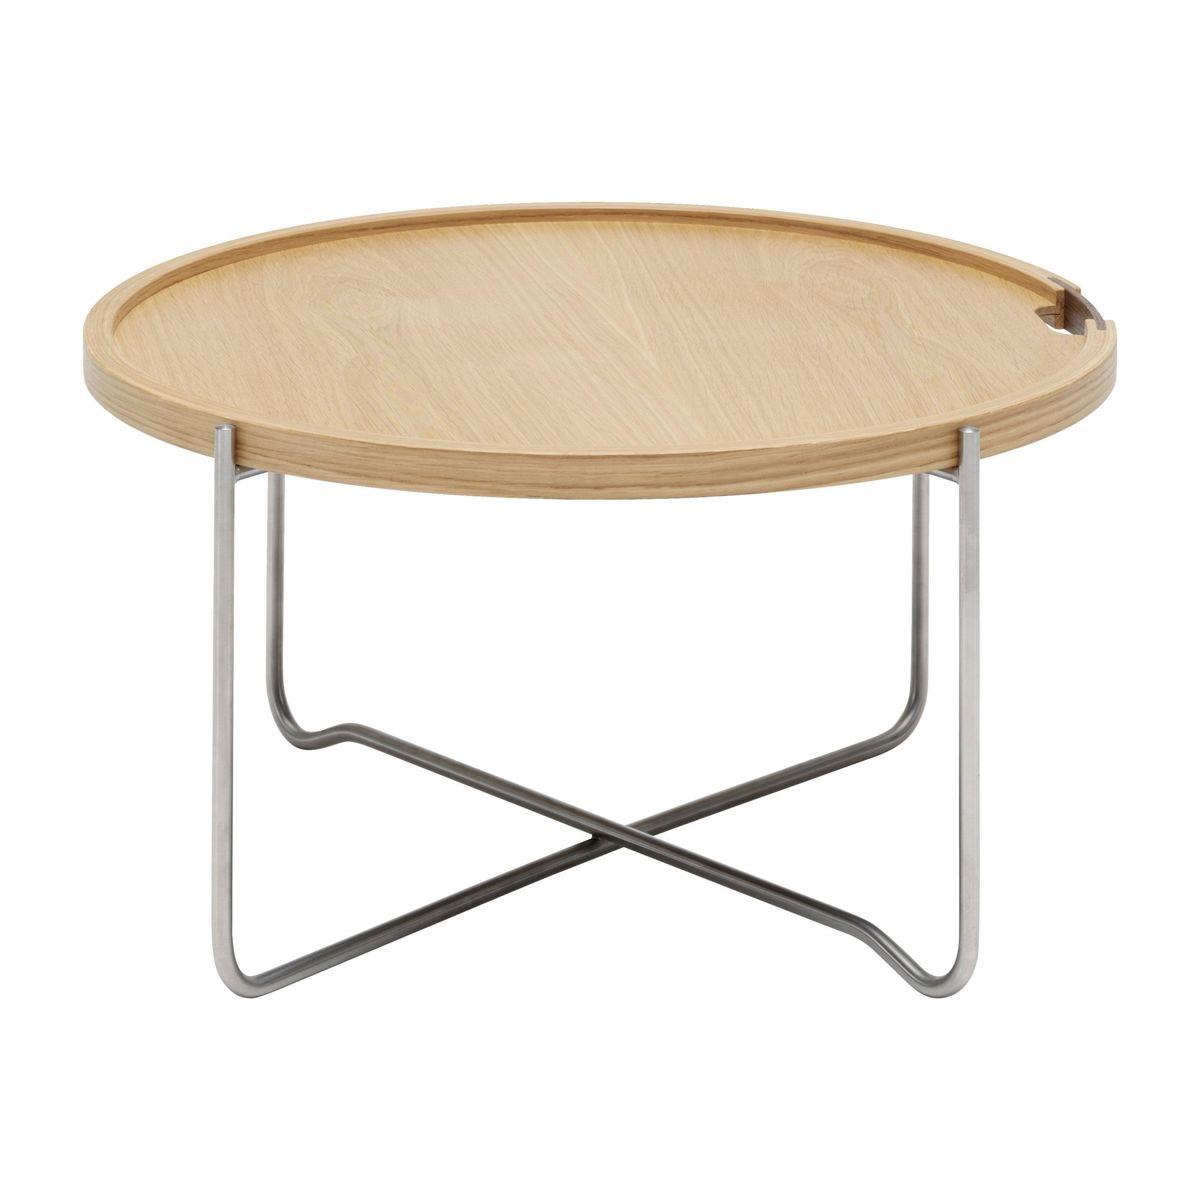 Carl Hansen CH417 Side Table Tray